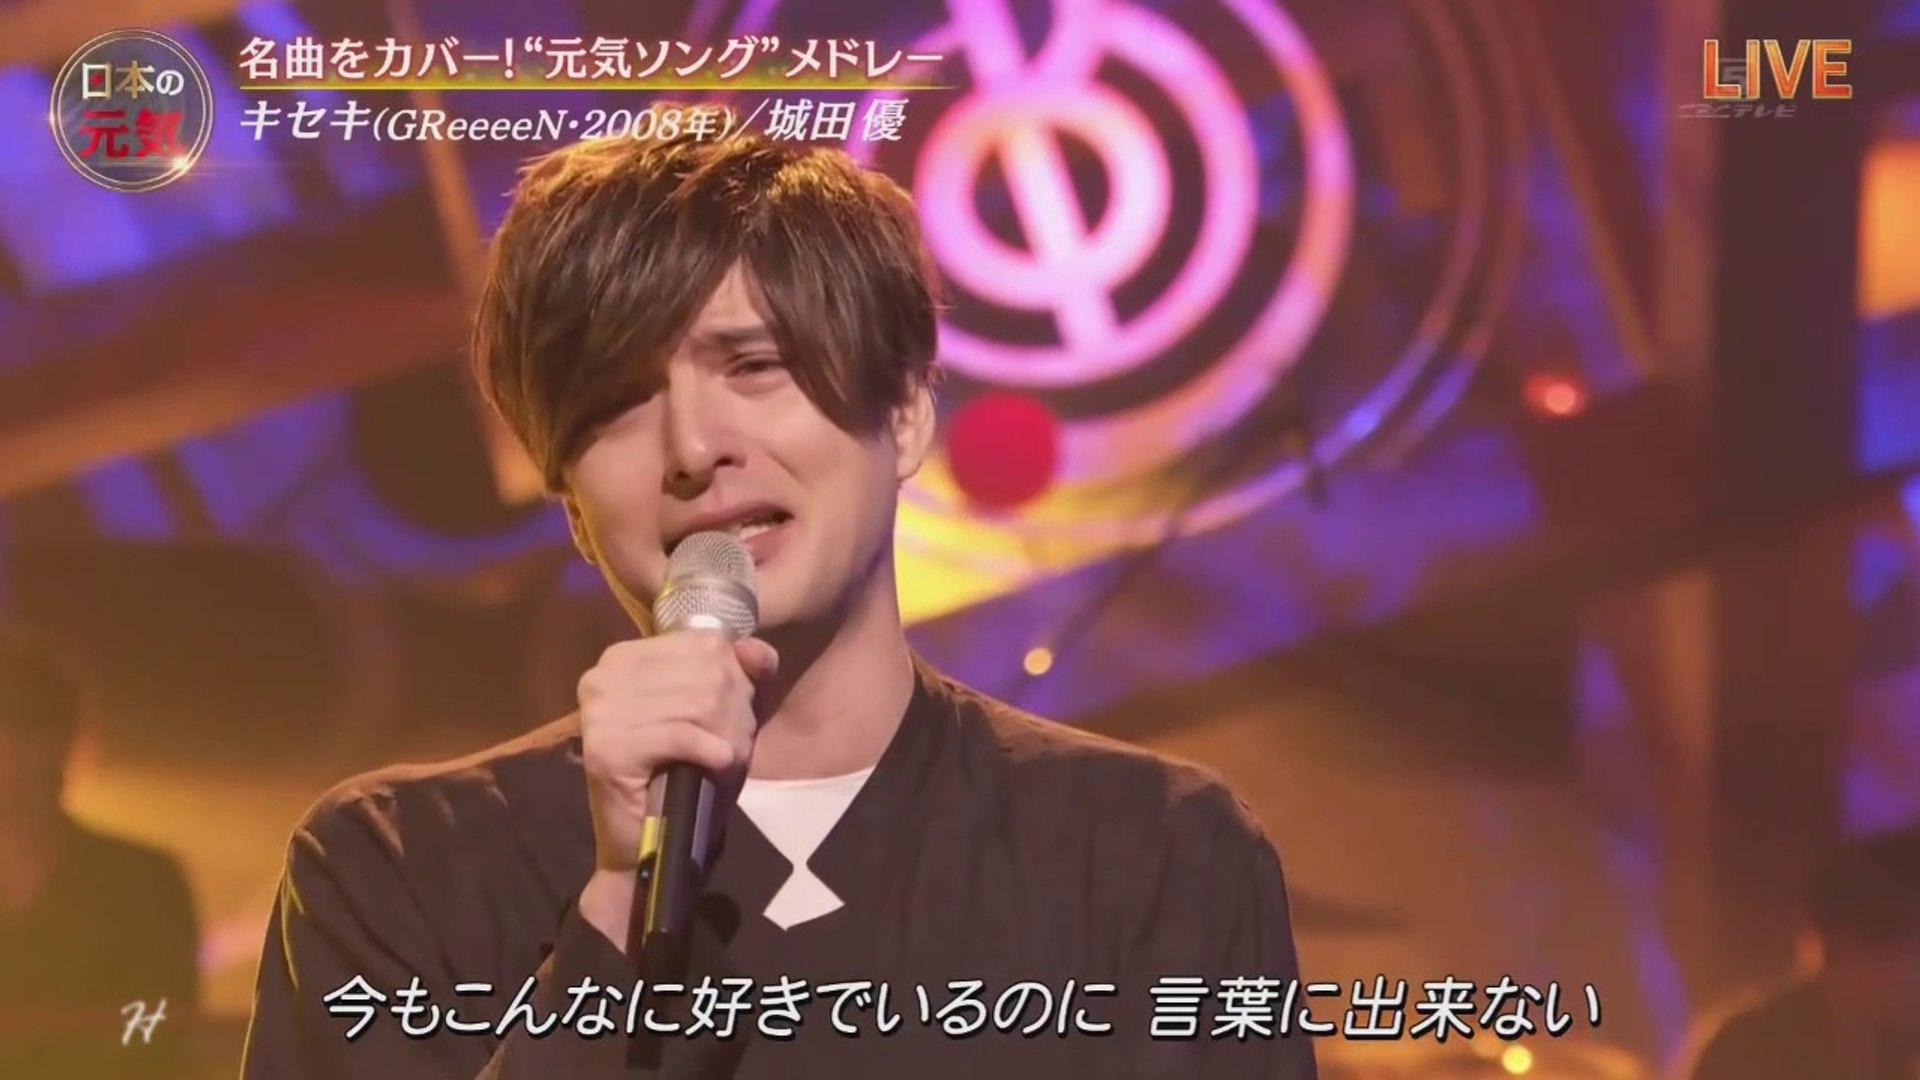 城田 2020 優 日 の 音楽